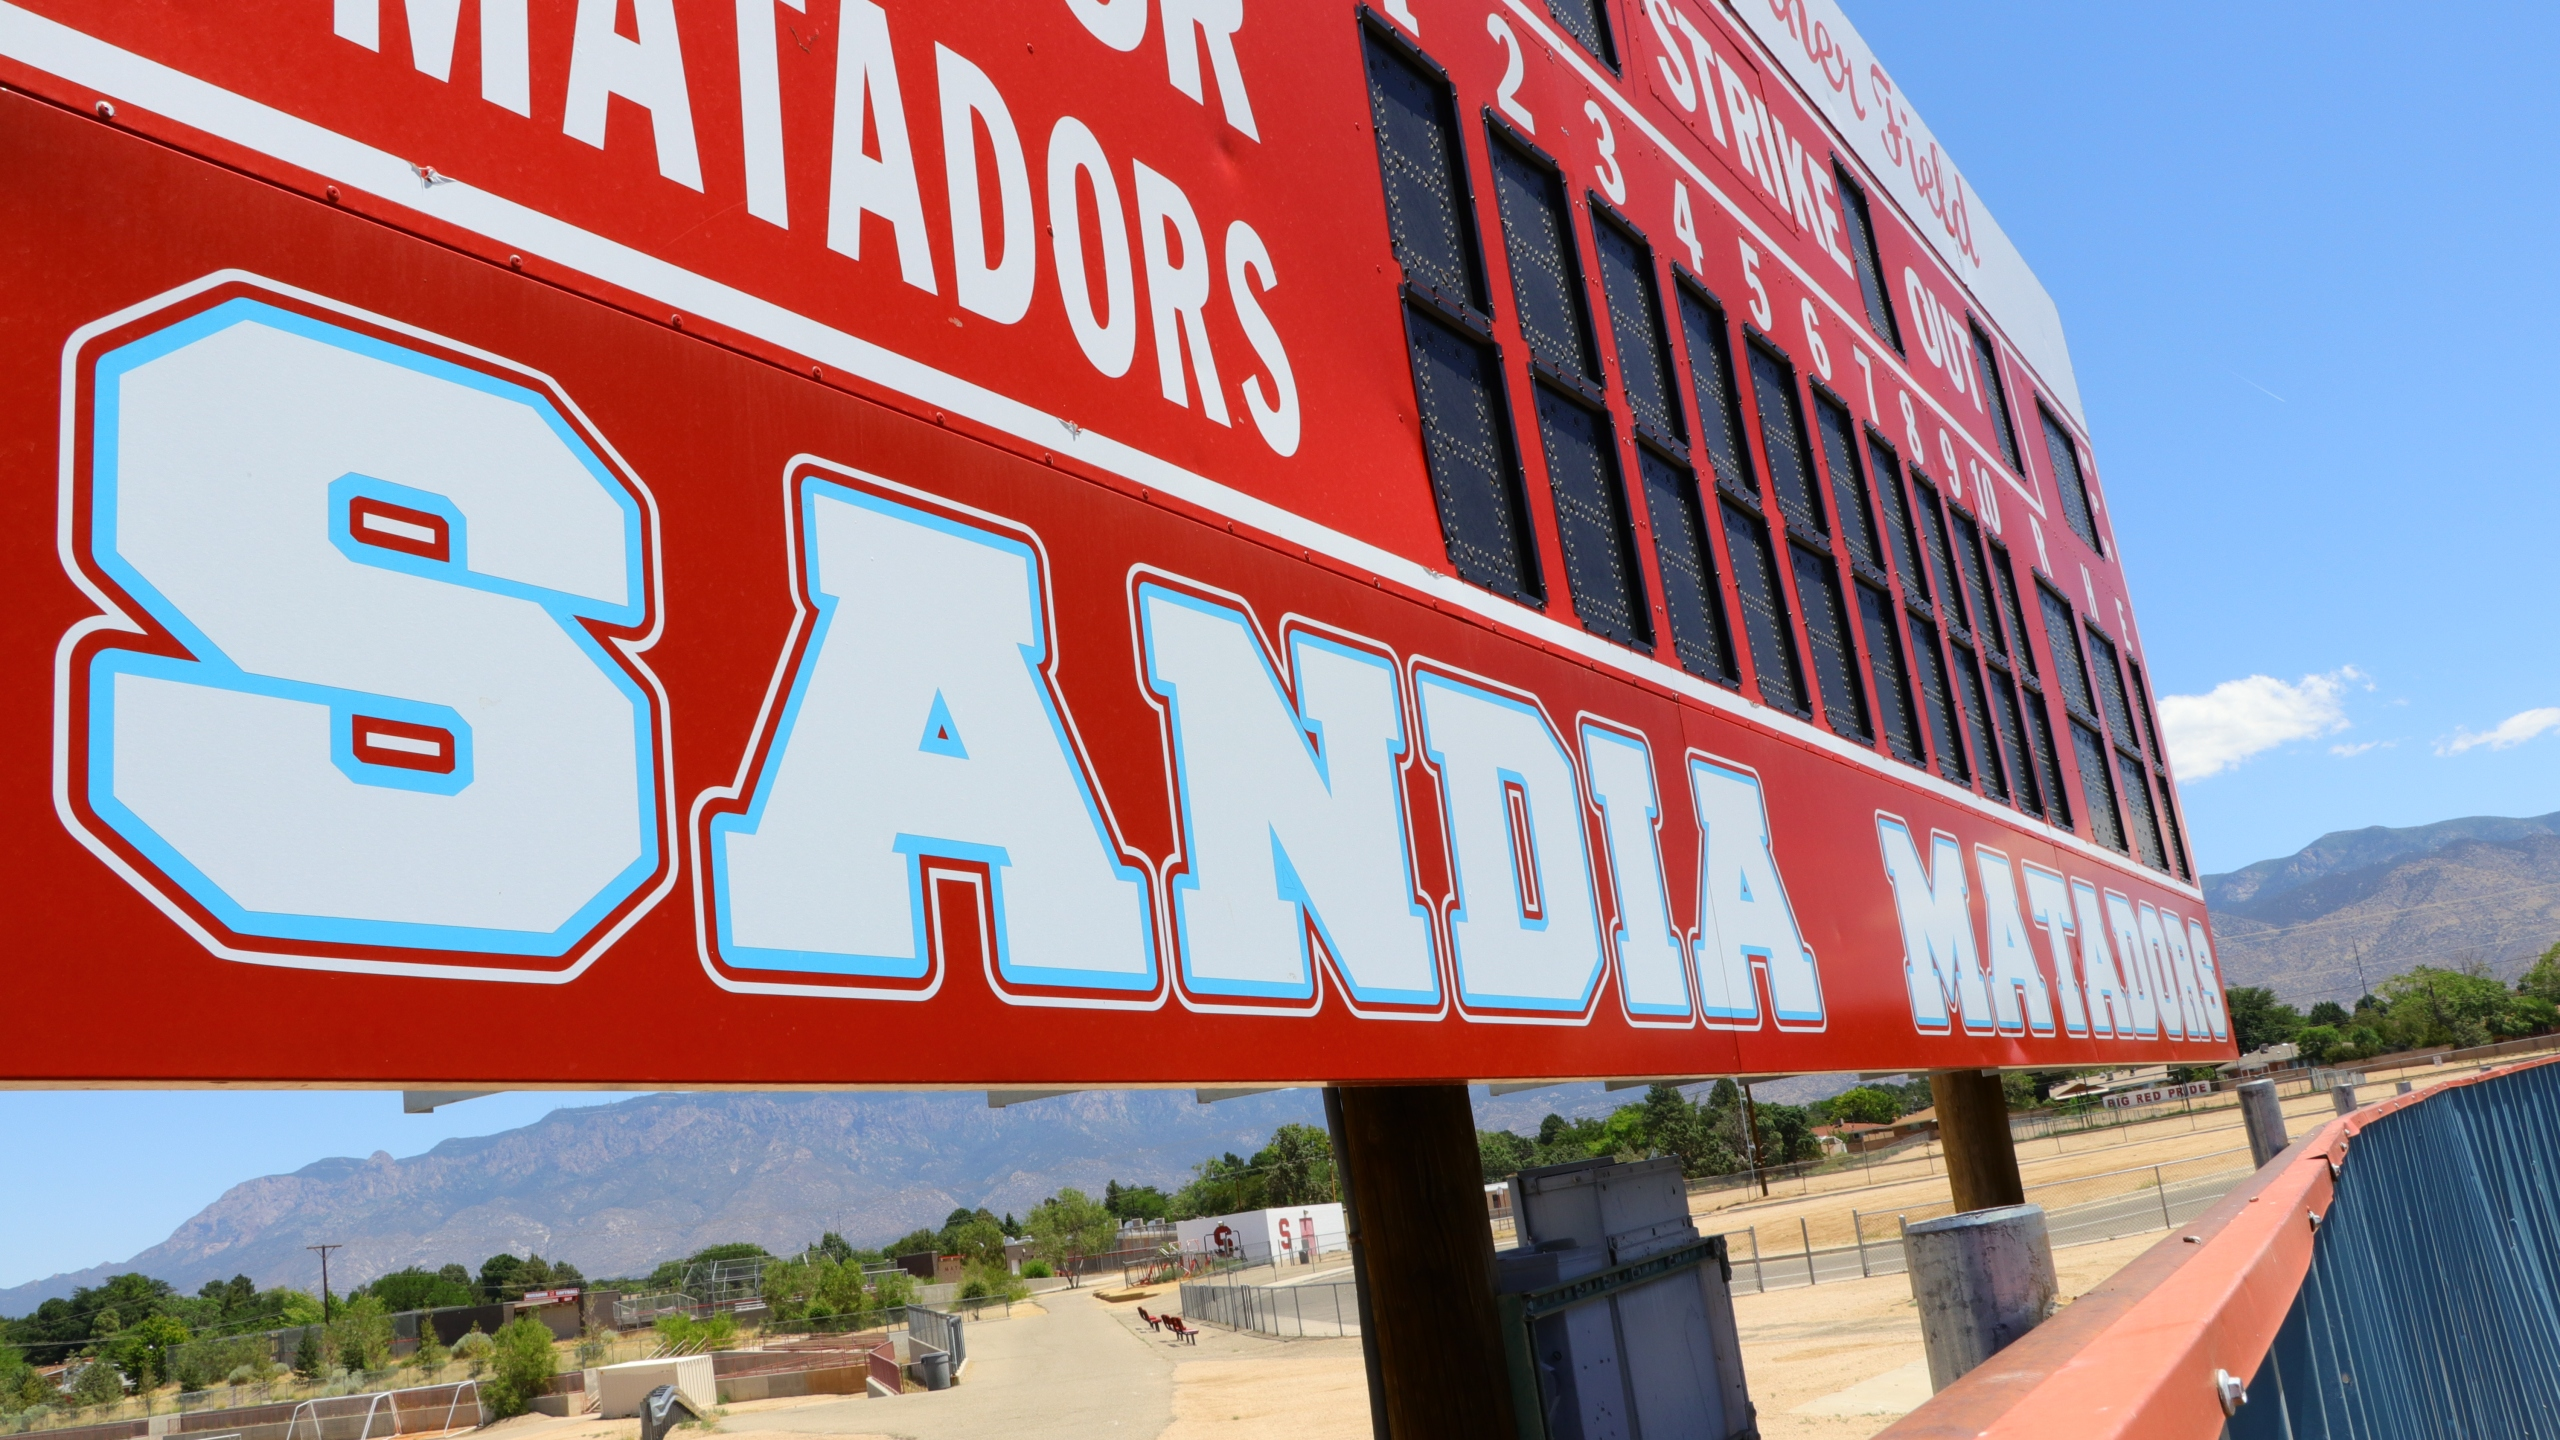 stockimg - Sandia High School